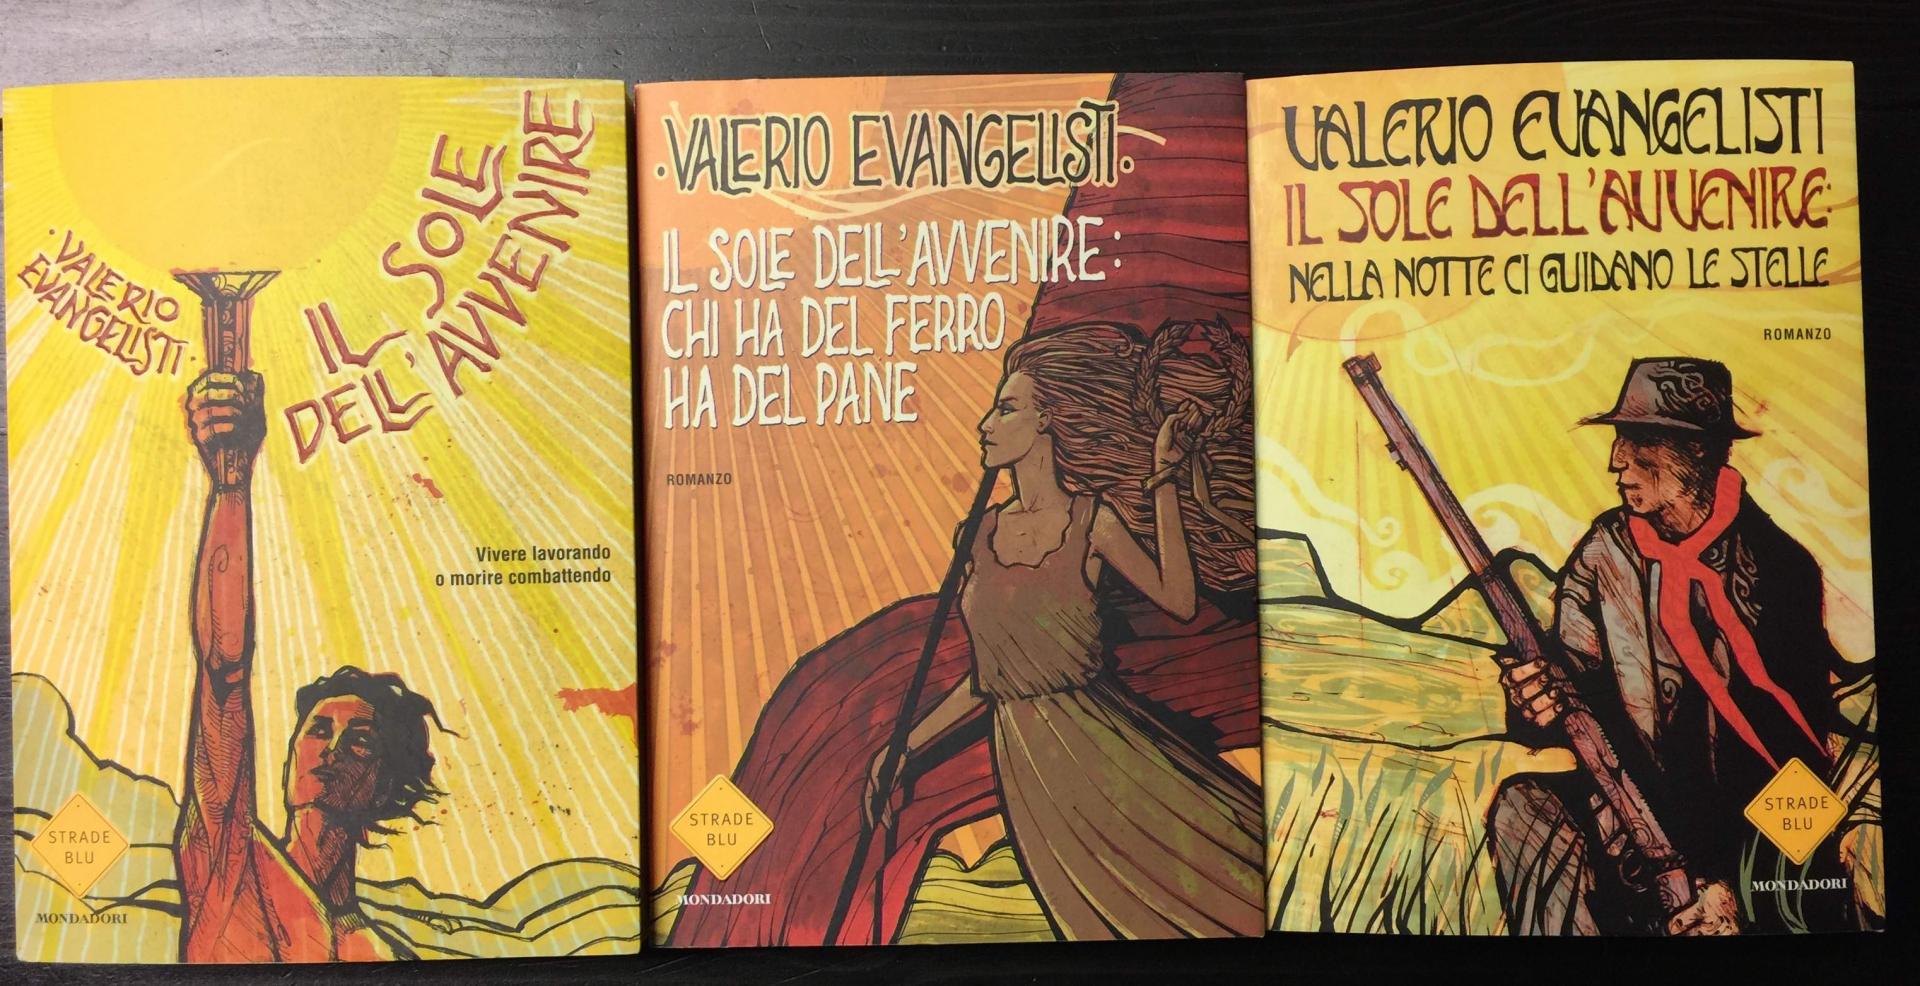 La trilogia di Valerio Evangelisti